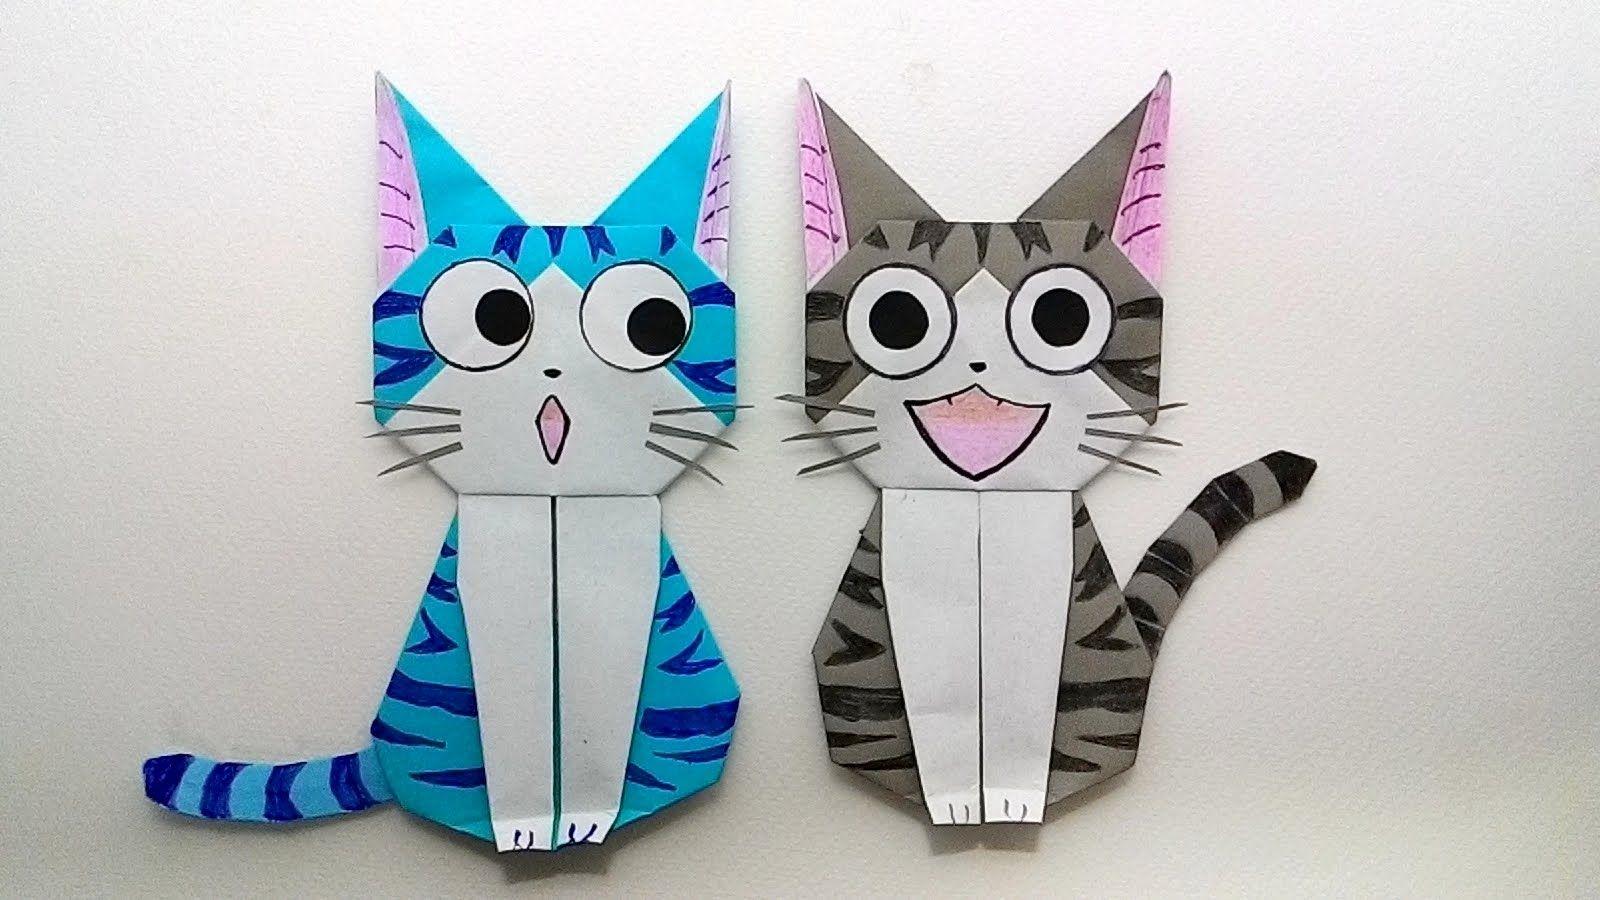 Origami Cat Chi S Sweet Home พ บกระดาษ แมวจ บ านน ต องม เหม ยว ศ ลปะการพ บกระดาษ ส ตว ต กตา